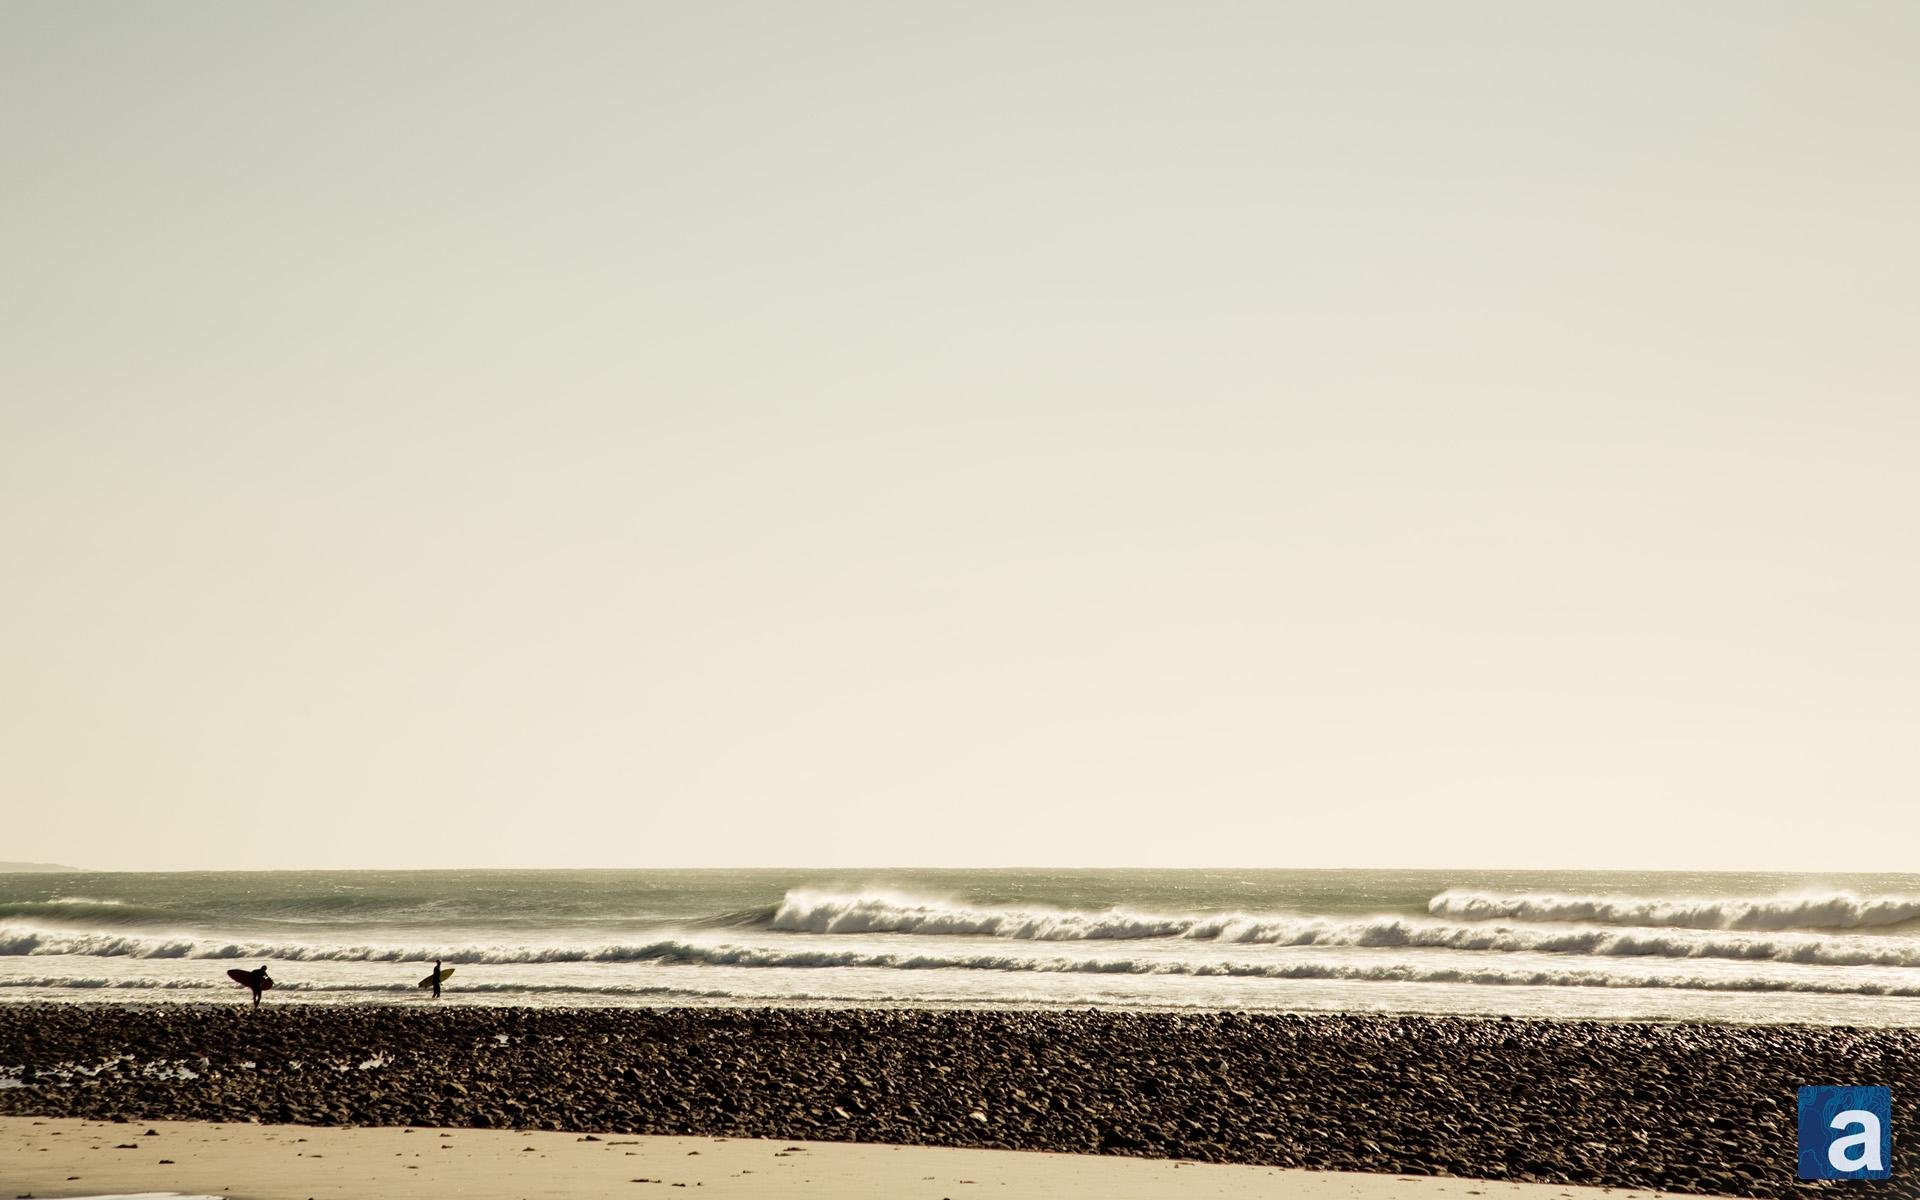 Wallpaper Wednesday Surfing Baja California Mexico adventure 1920x1200